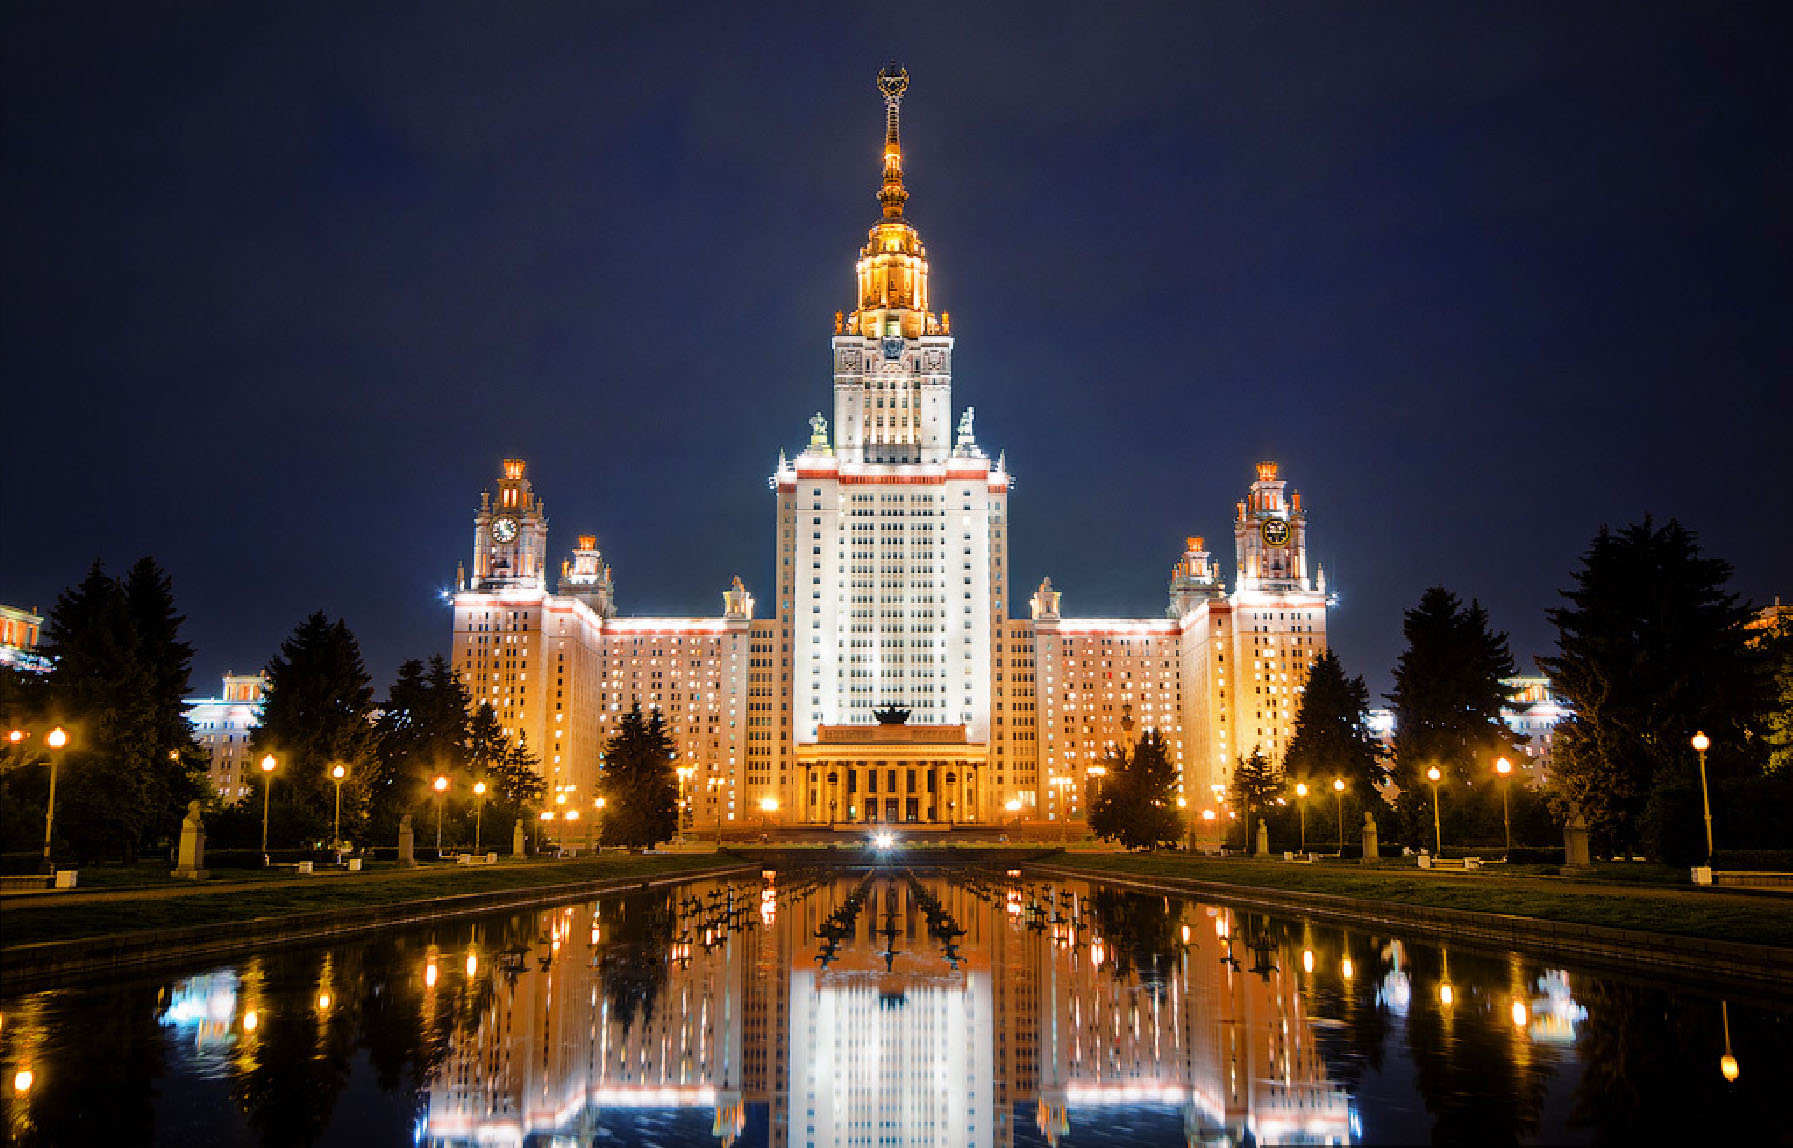 تور روسیه ( 4 شب سنت پترزبورگ + 3 شب مسکو ) – 6 مرداد ماه